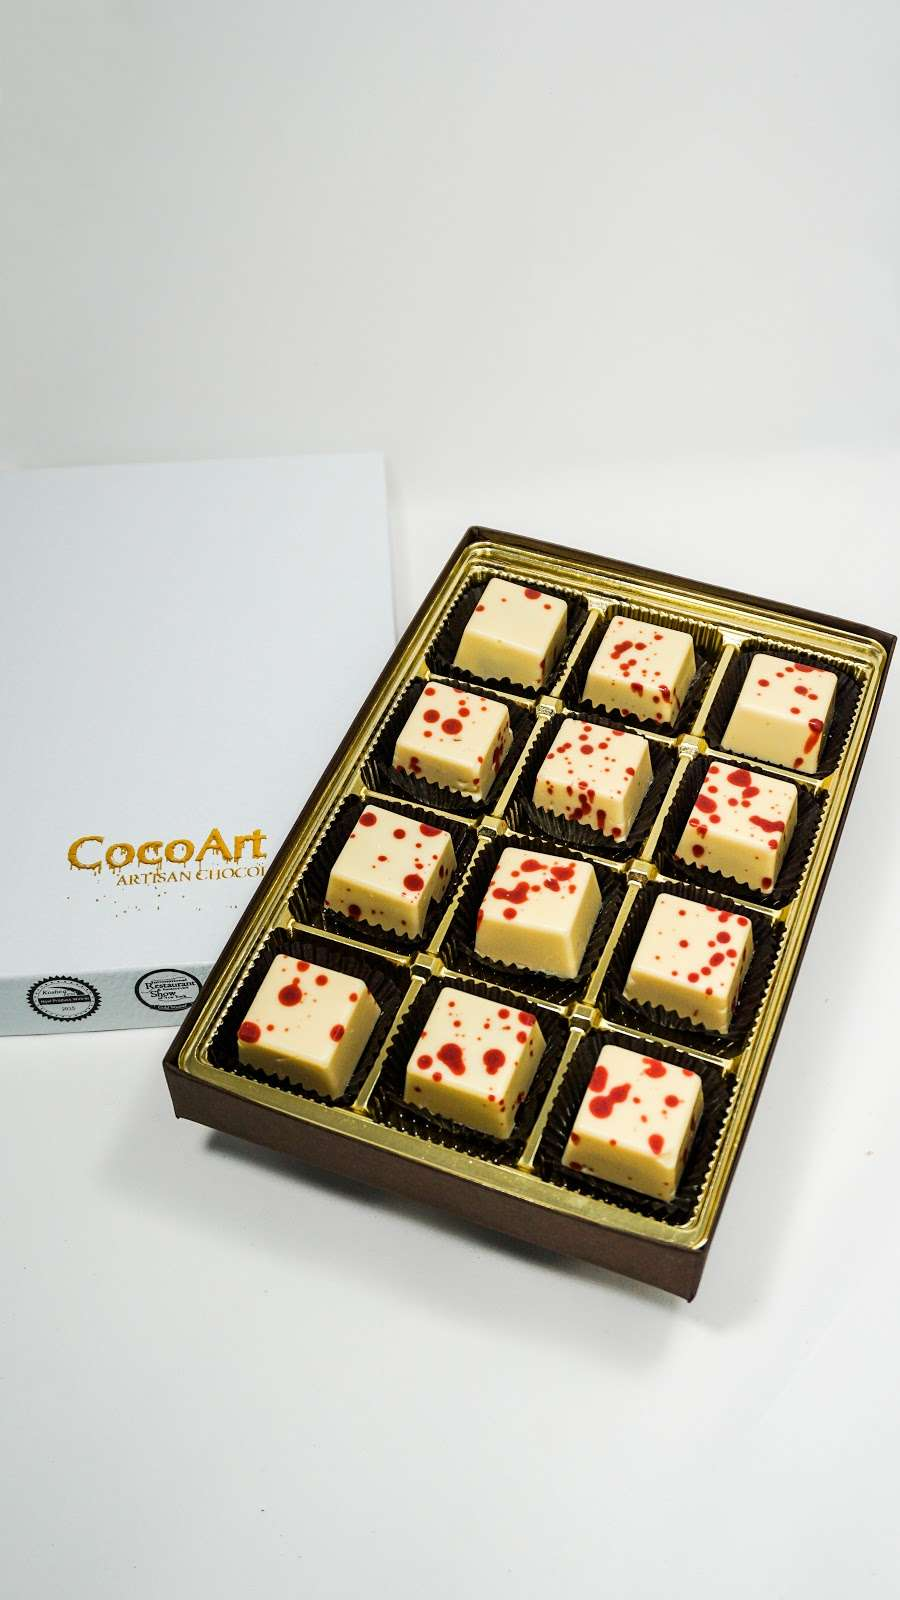 CocoArt Chocolate - store    Photo 9 of 10   Address: 20 Prag Blvd #002, Monroe, NY 10950, USA   Phone: (845) 248-1617